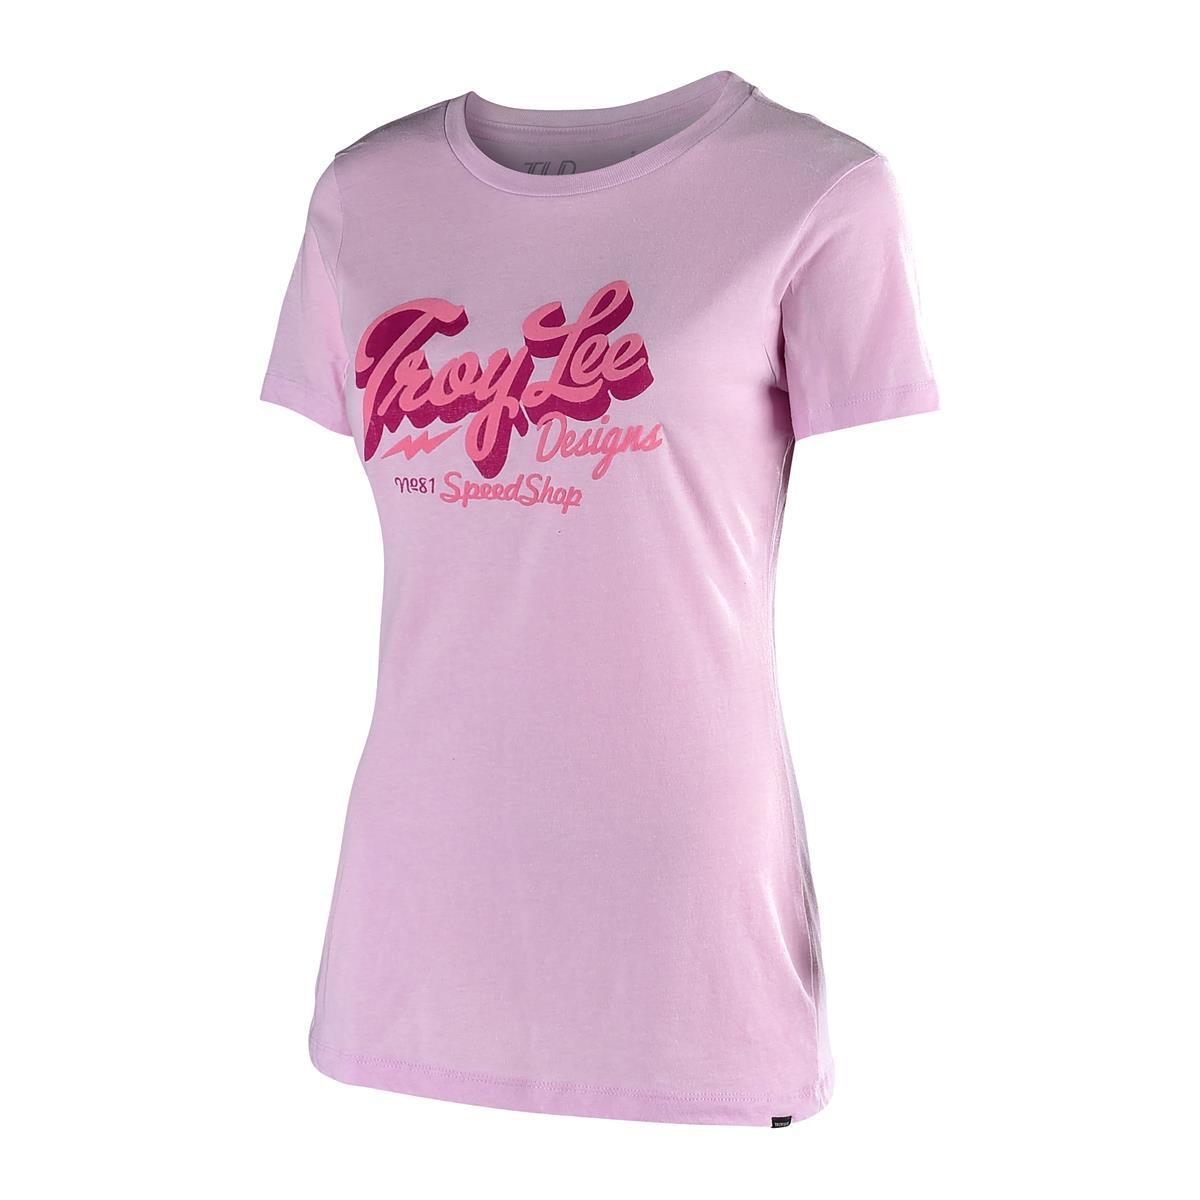 Troy Lee Designs Girls T-Shirt Vintage Speed Shop Lilac